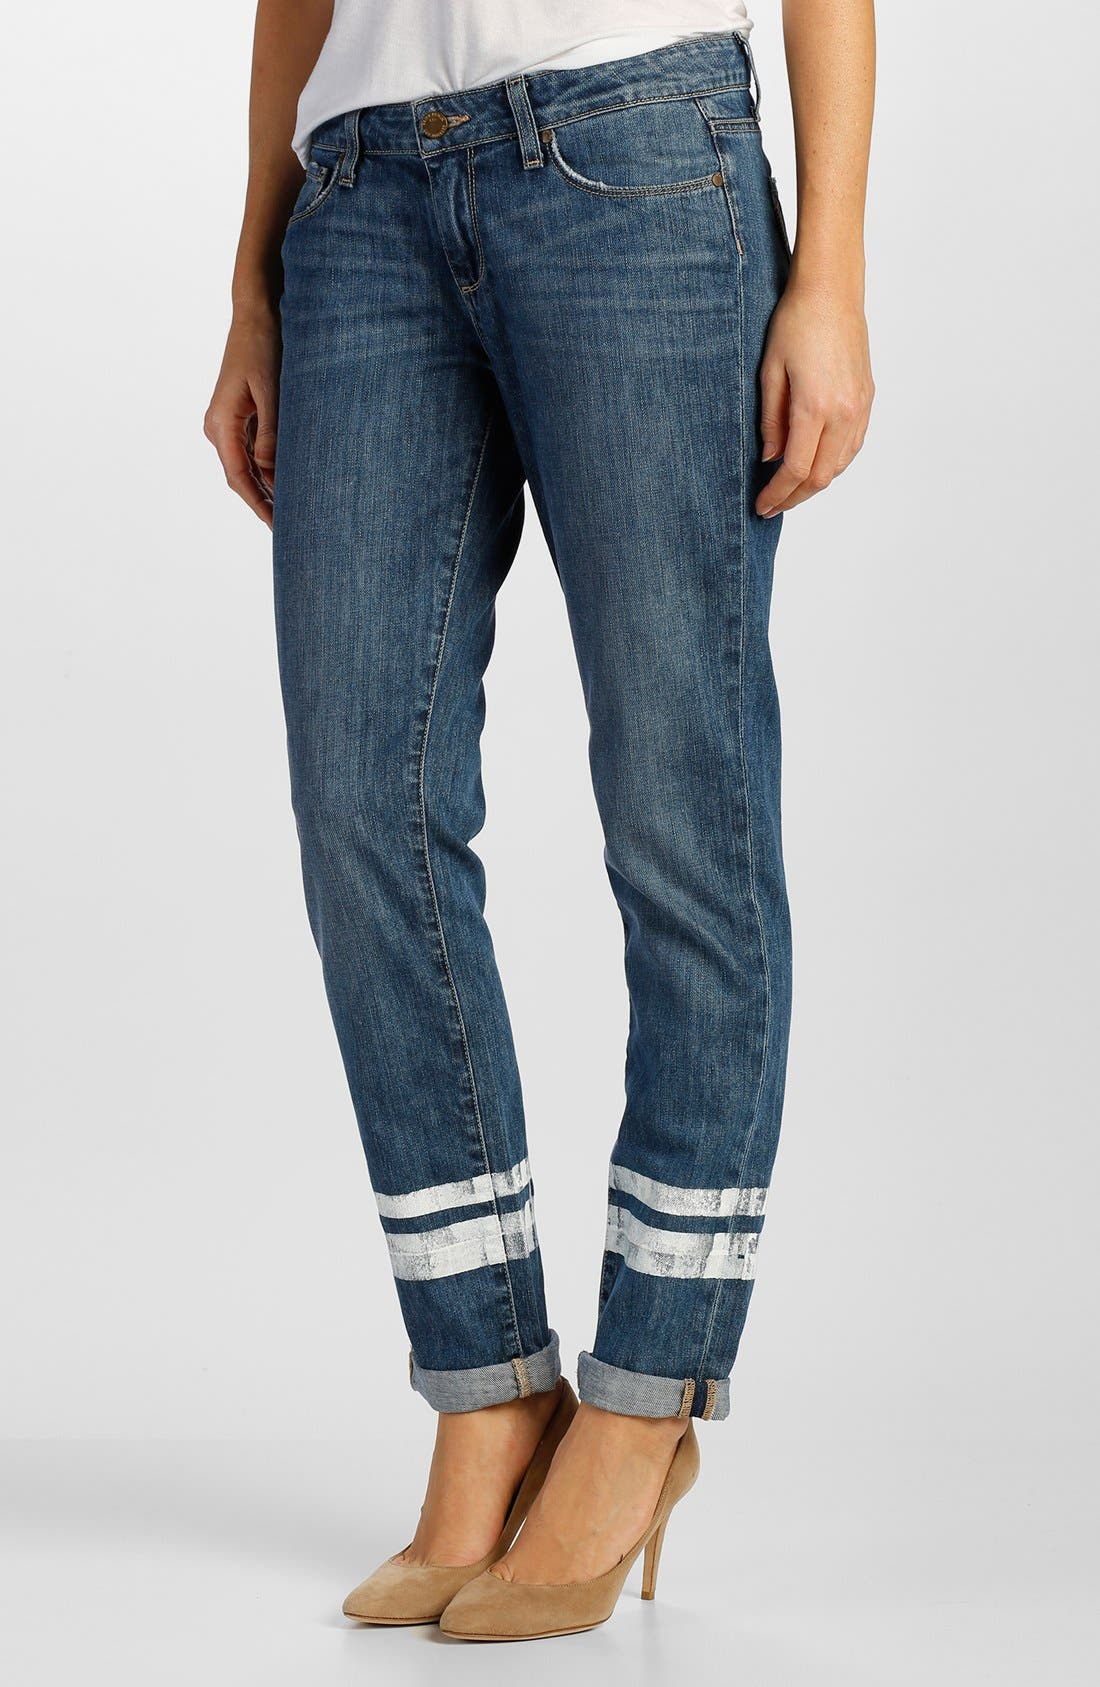 Main Image - Paige Denim 'Jimmy Jimmy' Boyfriend Jeans (Painted Stripe)